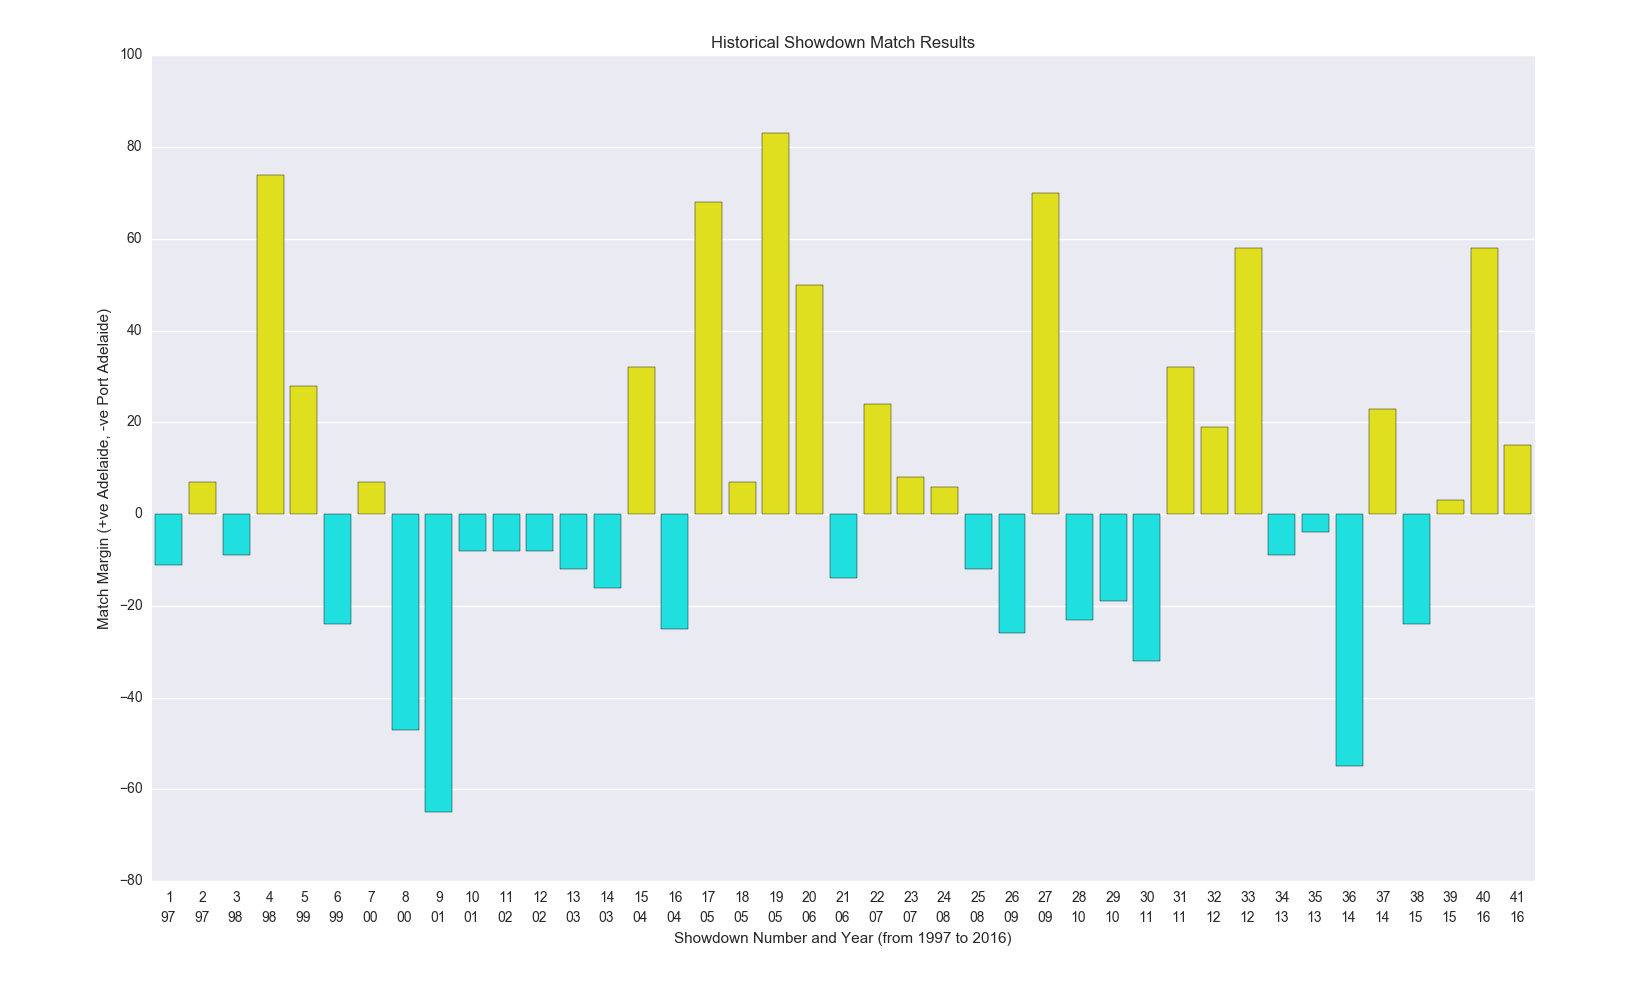 Figure-1: Historical Showdown Match Results (1997 – 2016)